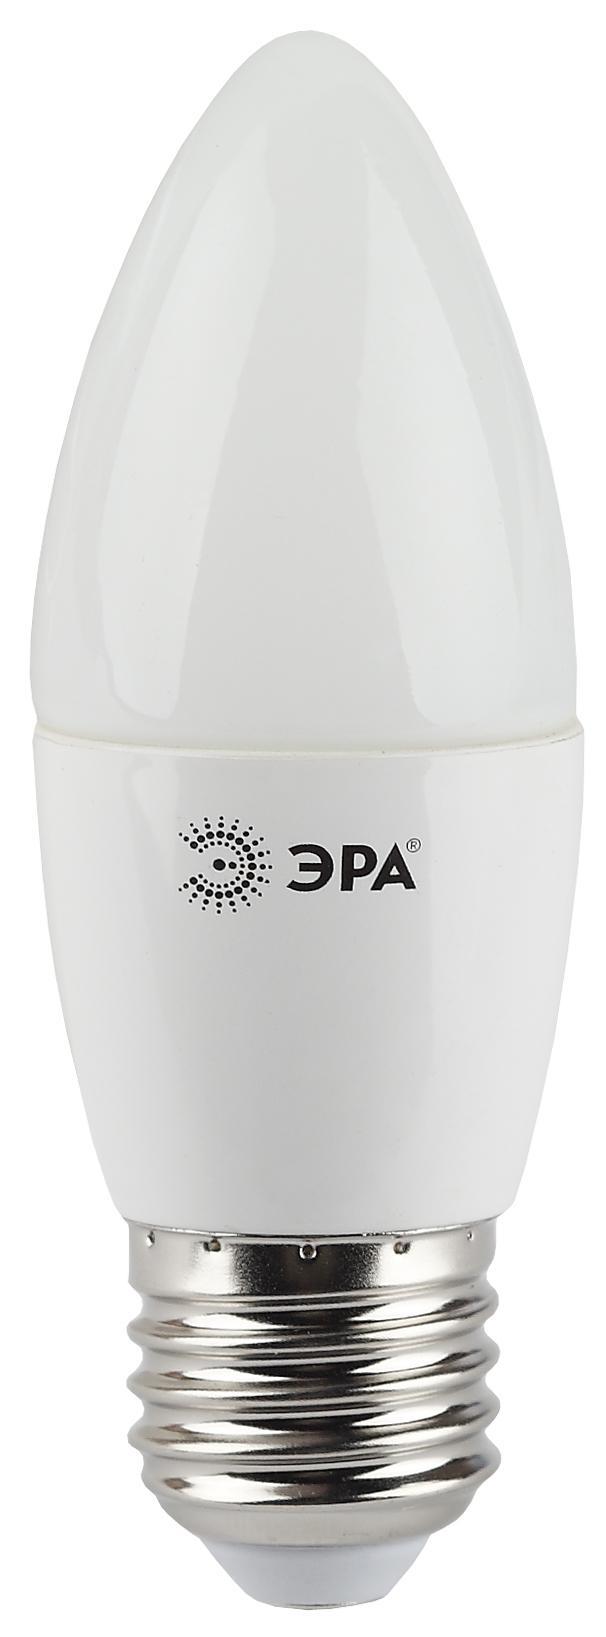 Лампа светодиодная ЭРА Led smd b35-7w-827-e27 лампа для духовок и печей эра led smd b35 5w 827 e14